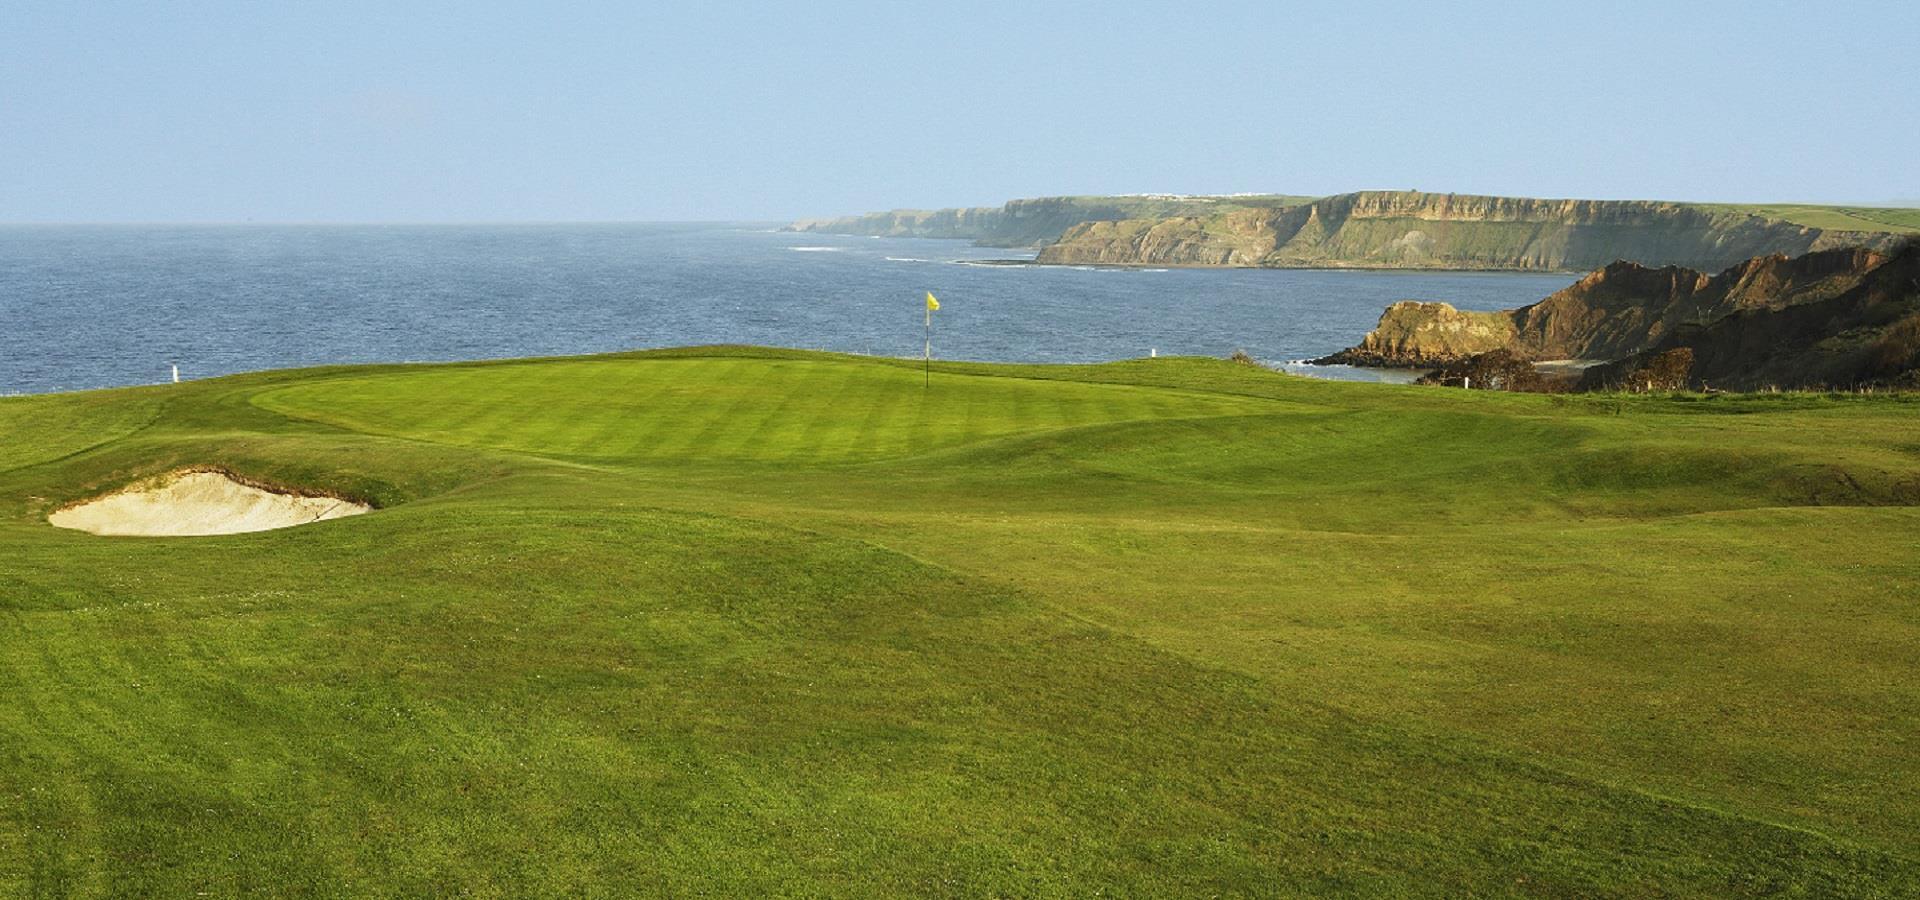 South Cliff Golf Club, Scarborough